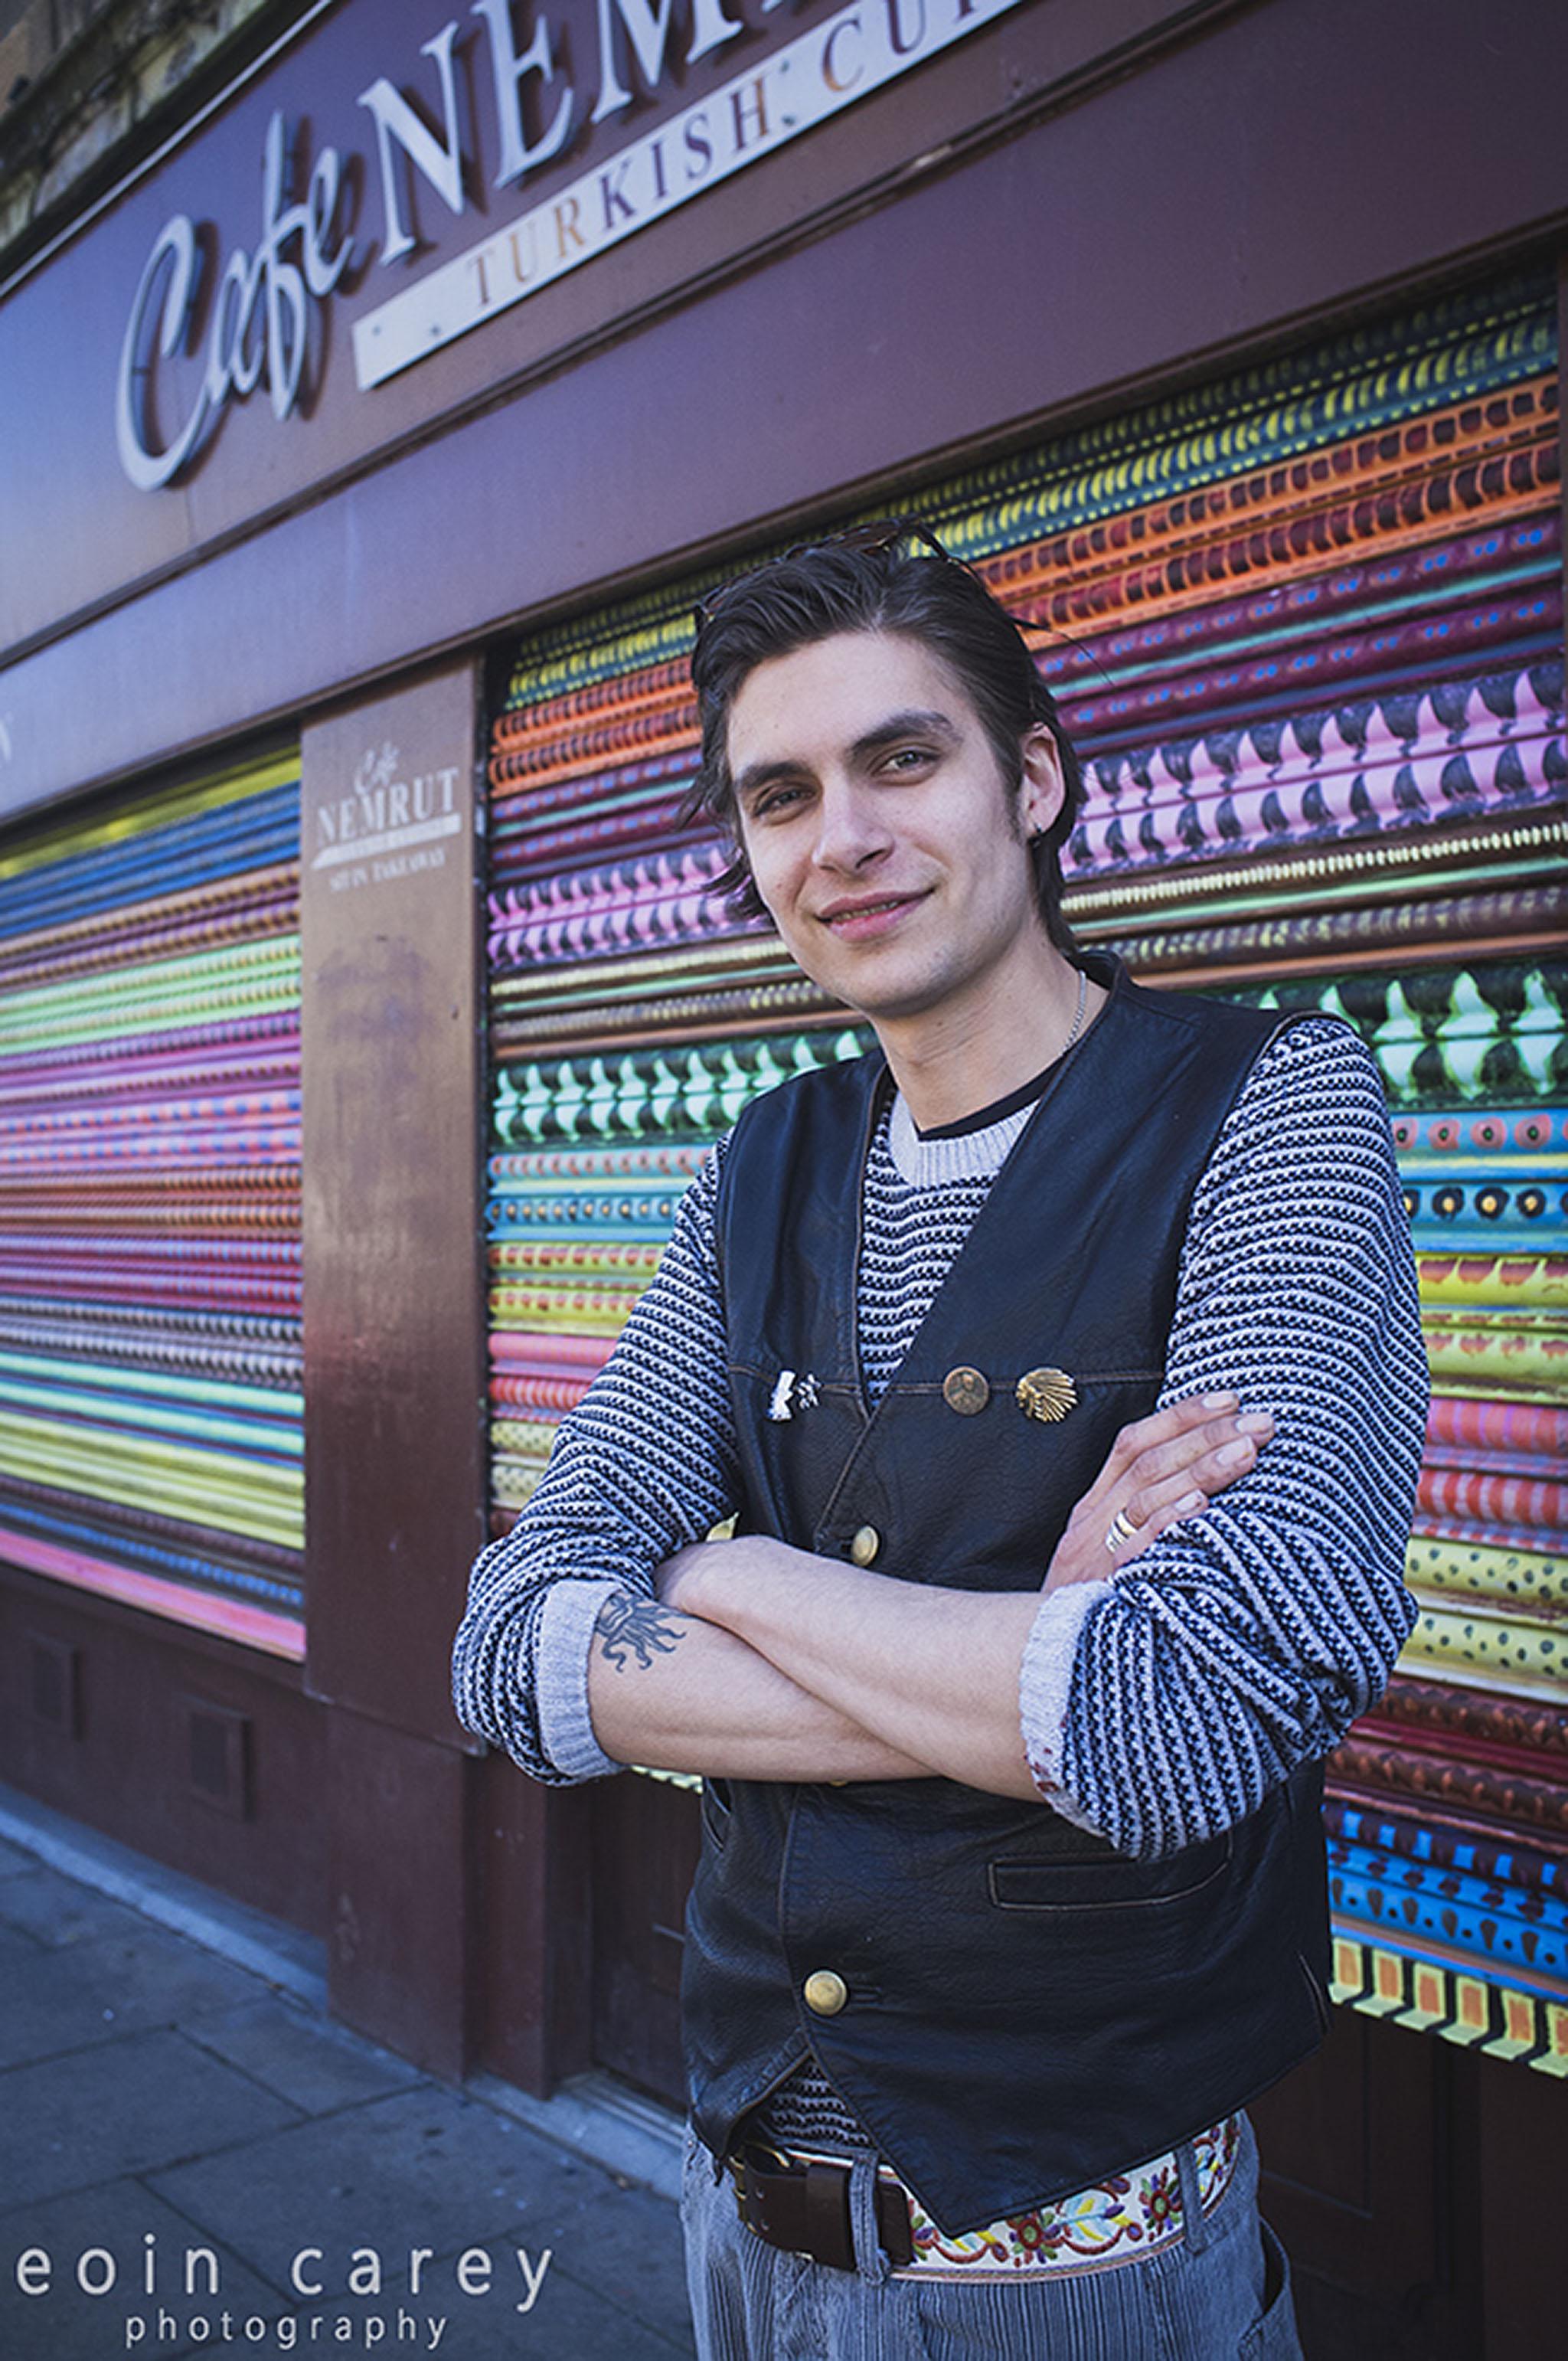 The Shutter Project – Omar Zingaro Bhatia on Cafe Nemrut